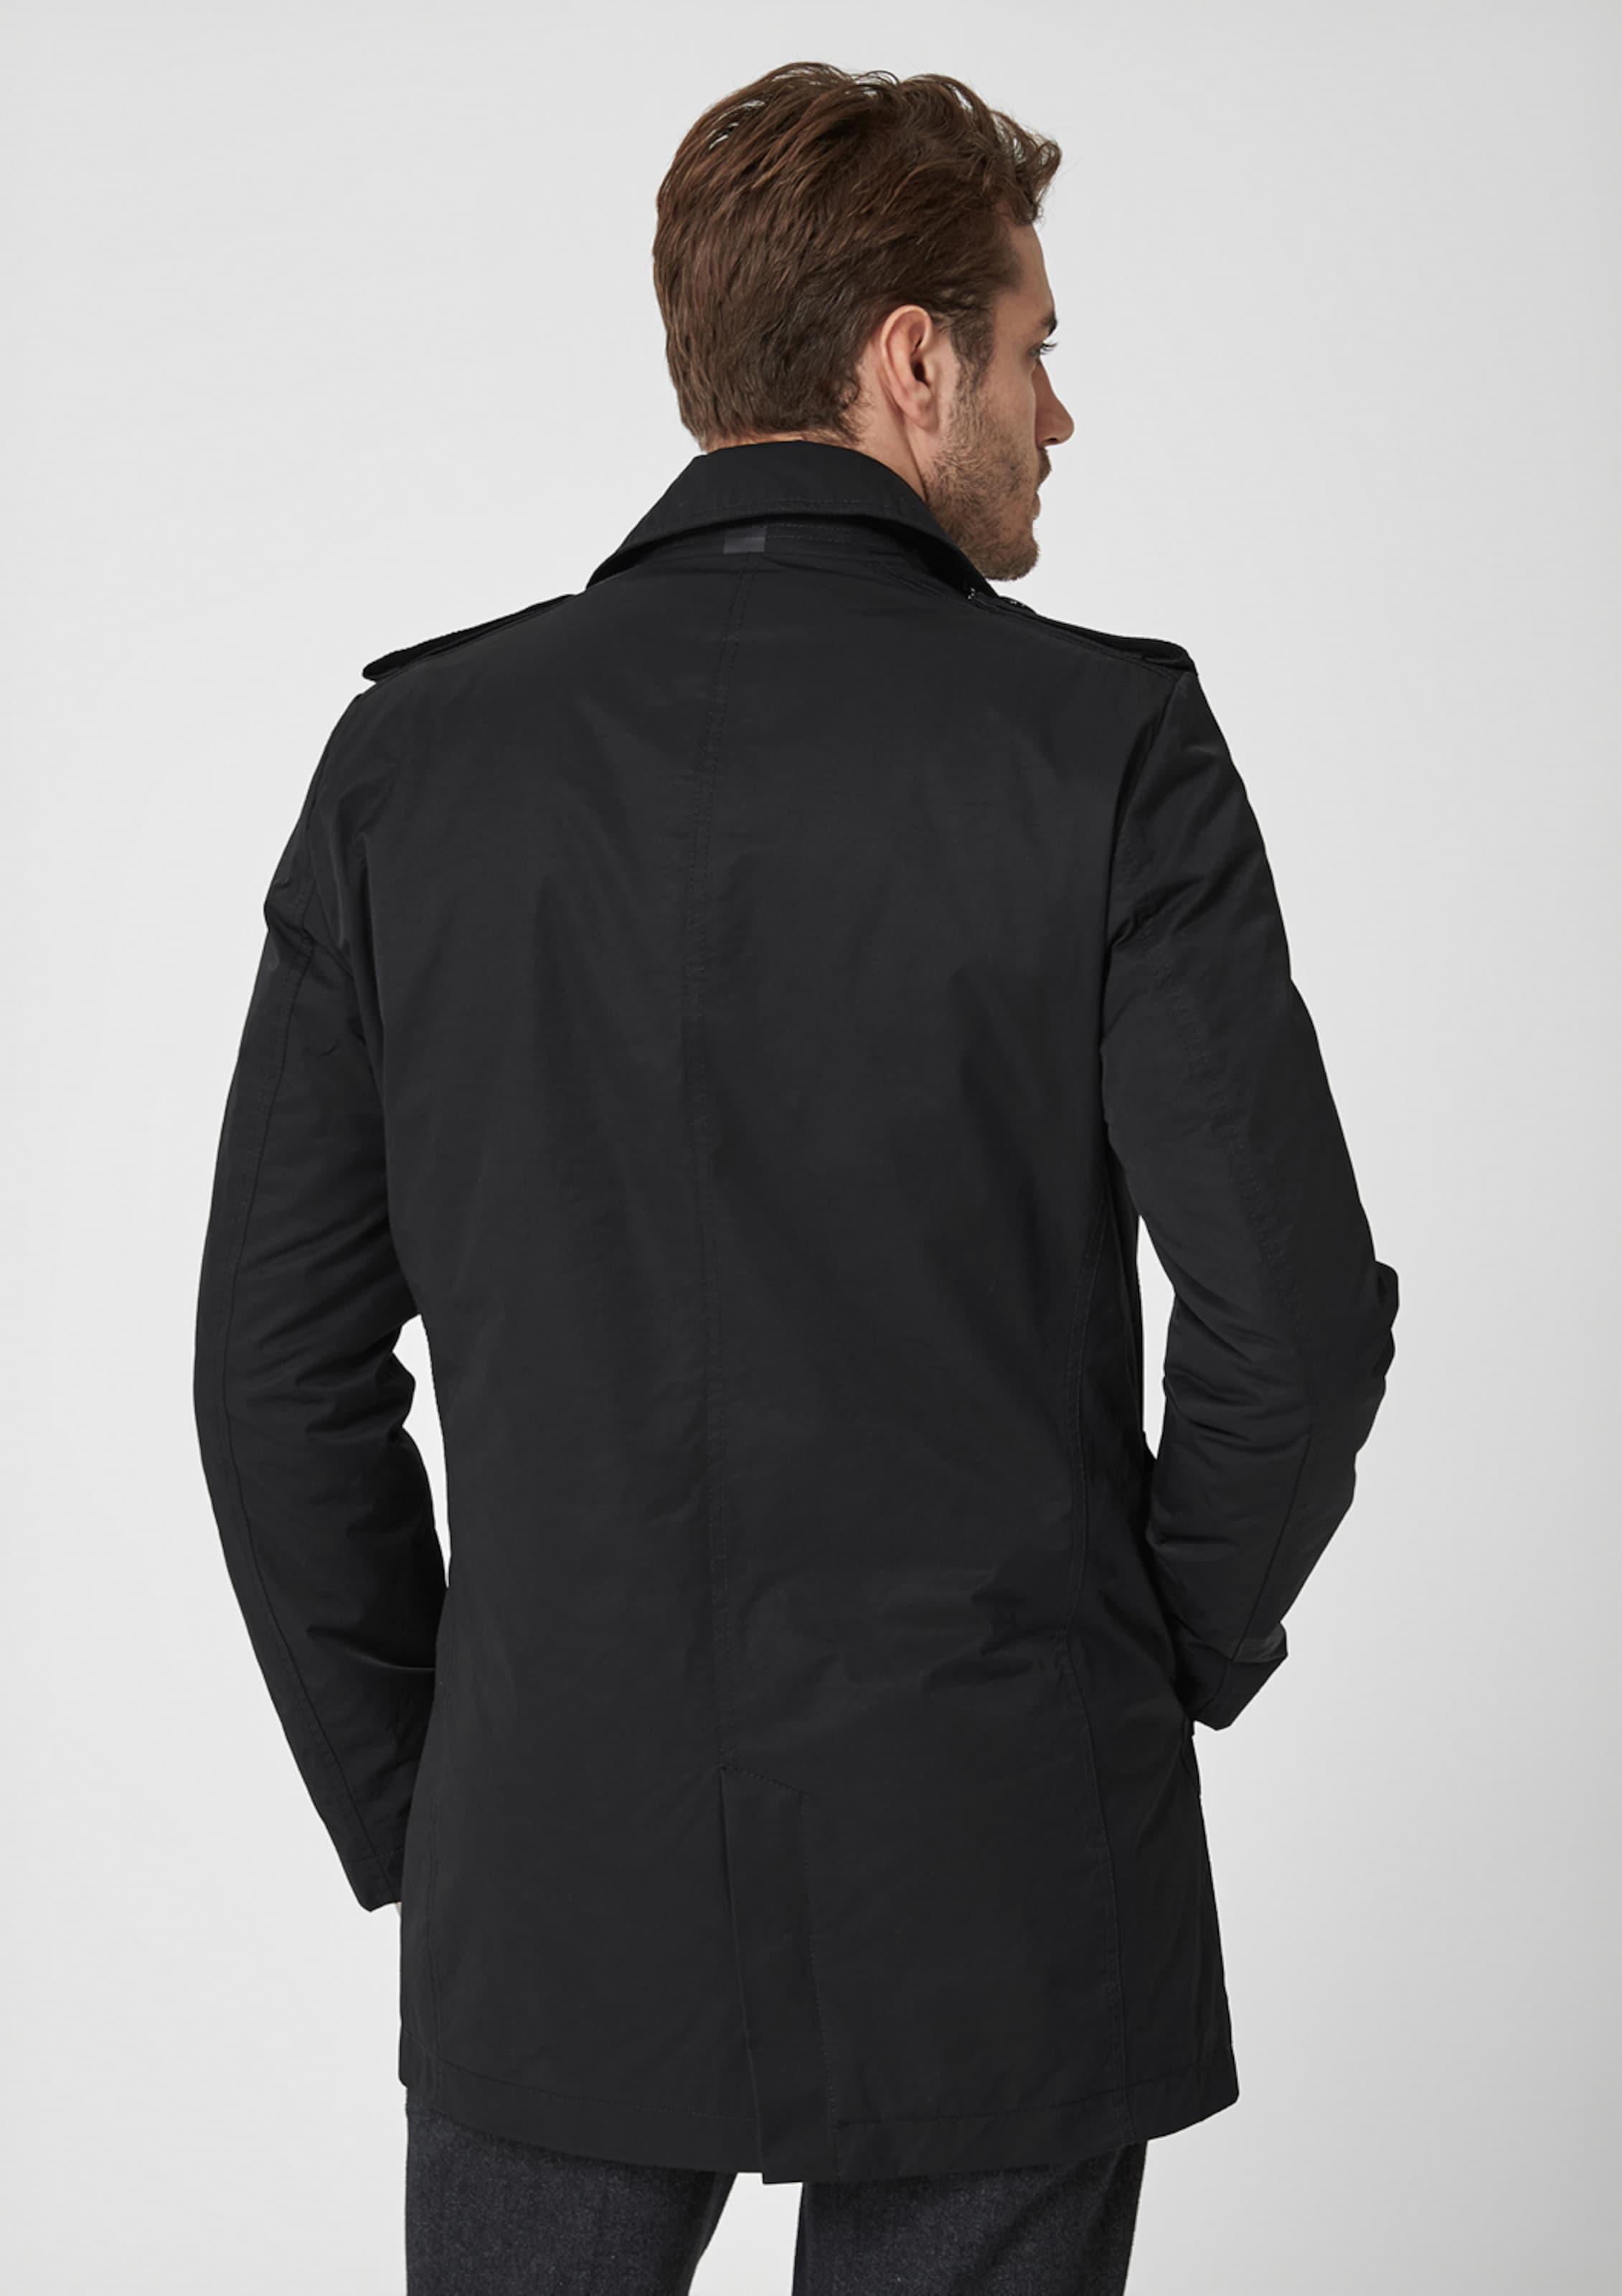 Schwarz S In oliver Black Trenchcoat Label f6gY7vybI